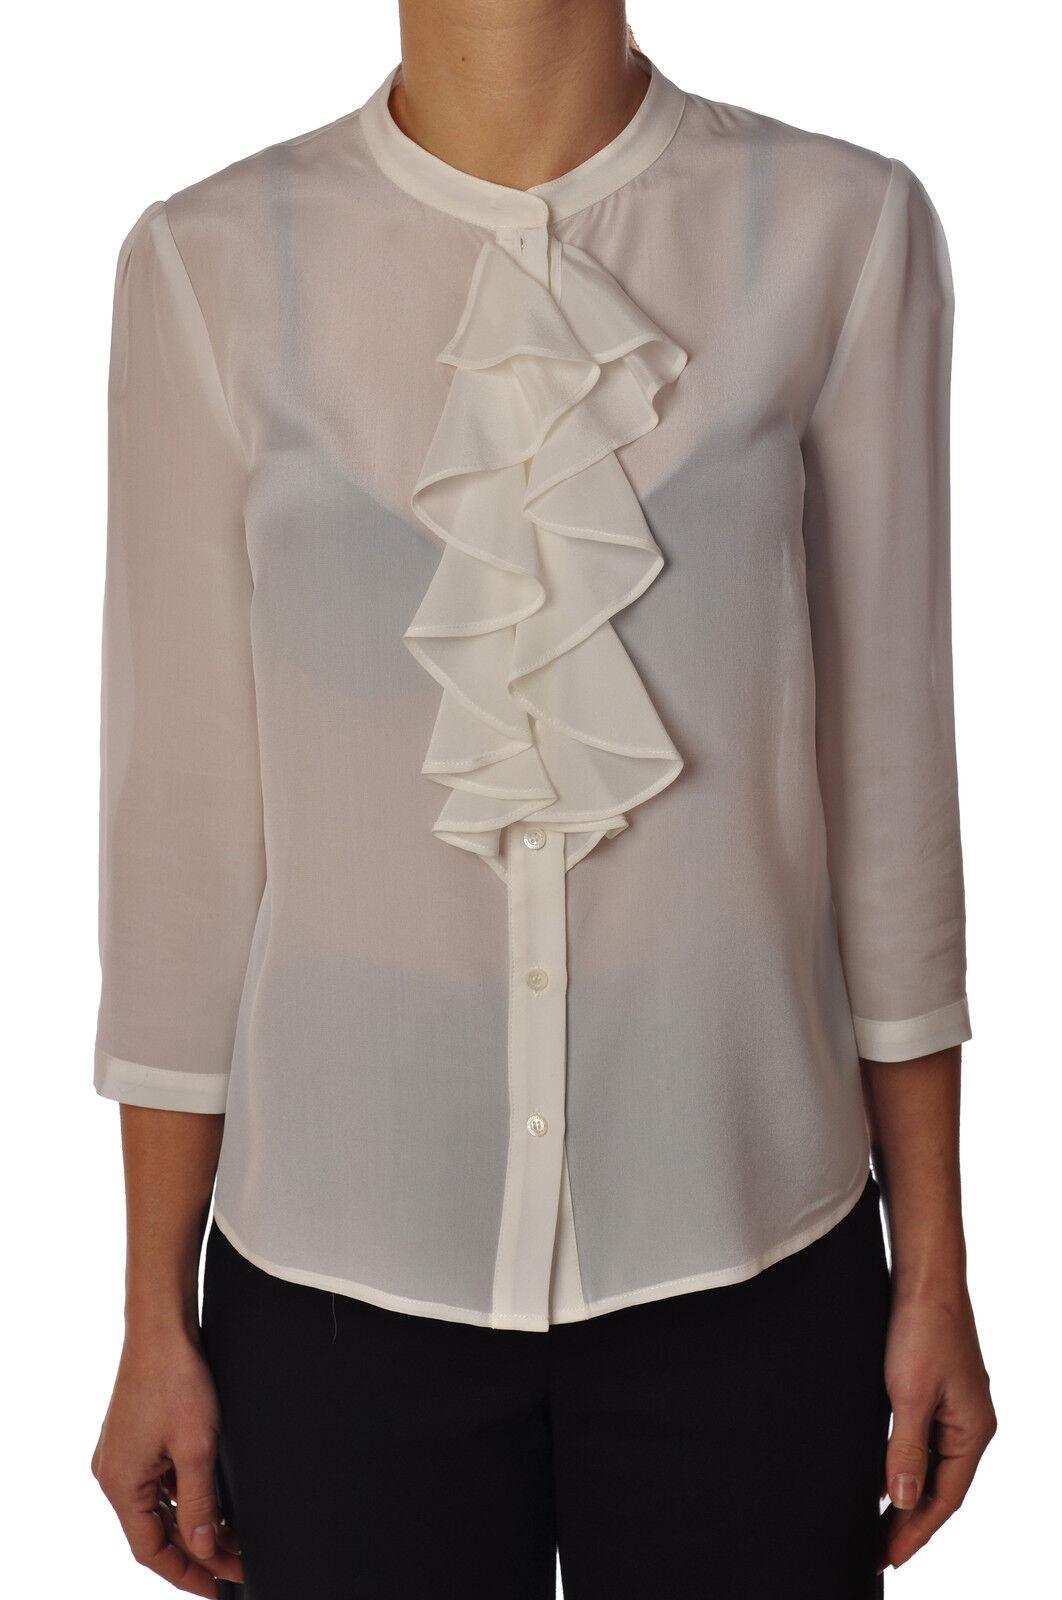 Patrizia Pepe - Shirts-Shirt - Woman - Weiß - 3279210D190711